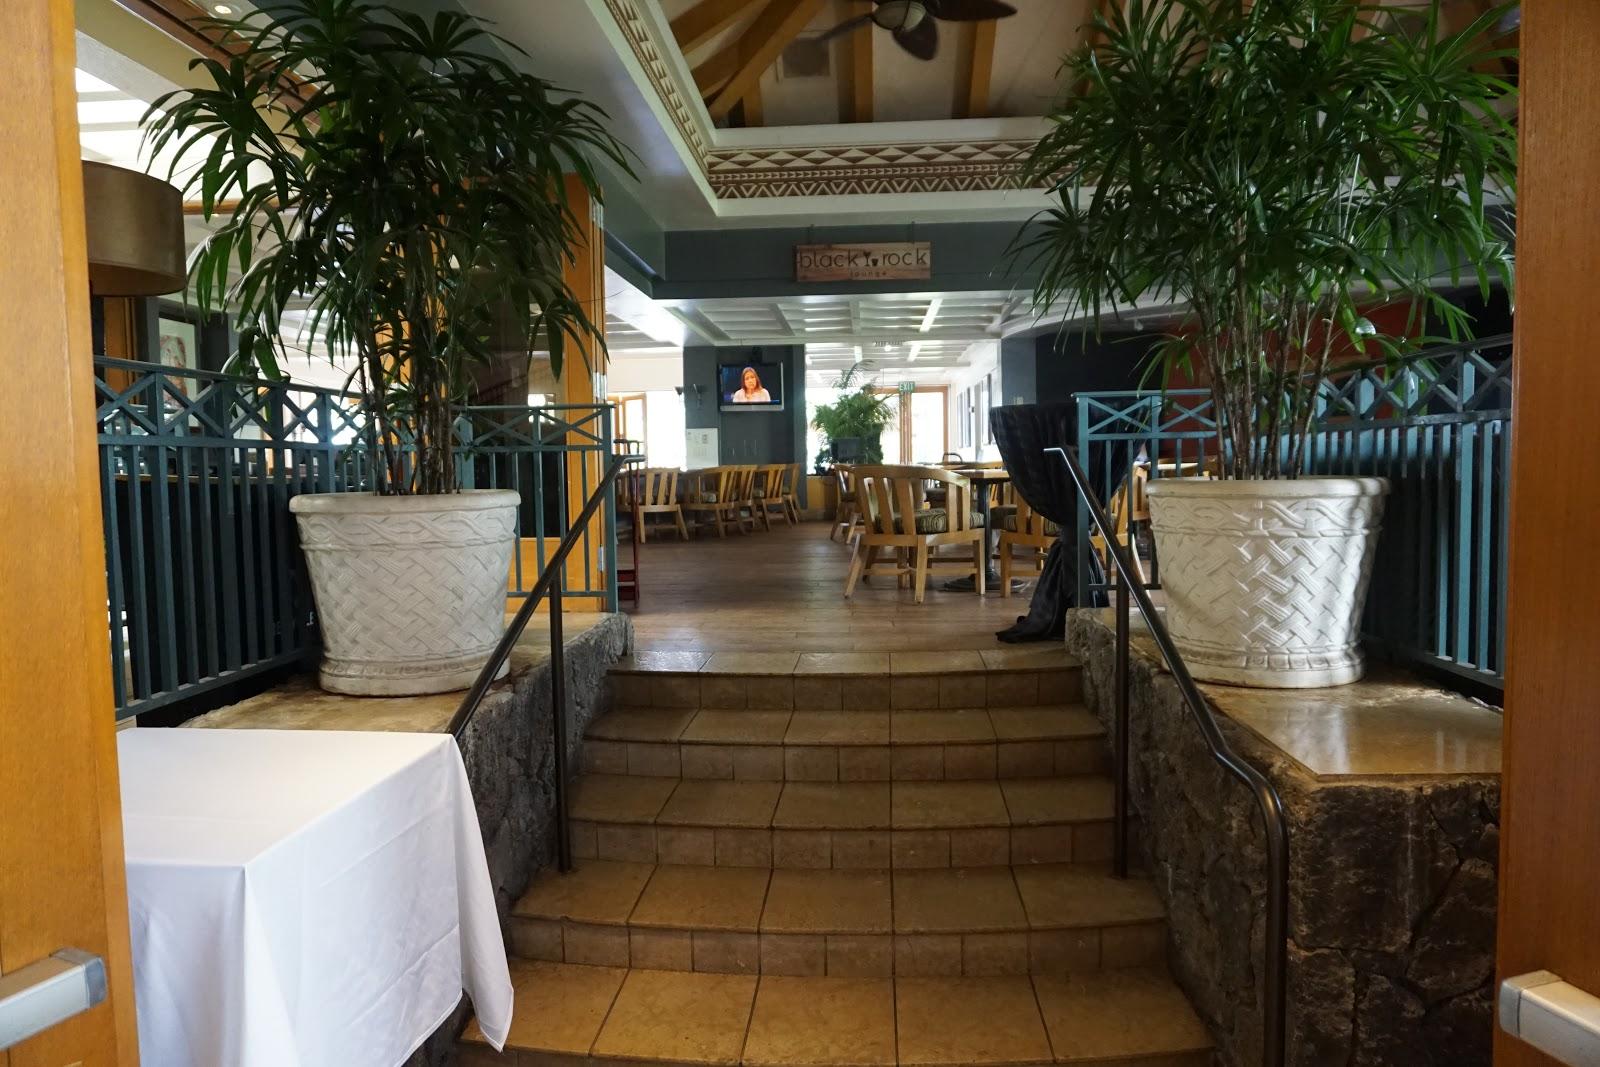 Two Restaurants Poolside Beachfront Bars Na Hoku Sheraton Lounge Lobby Coffee Cart And In Room Dining